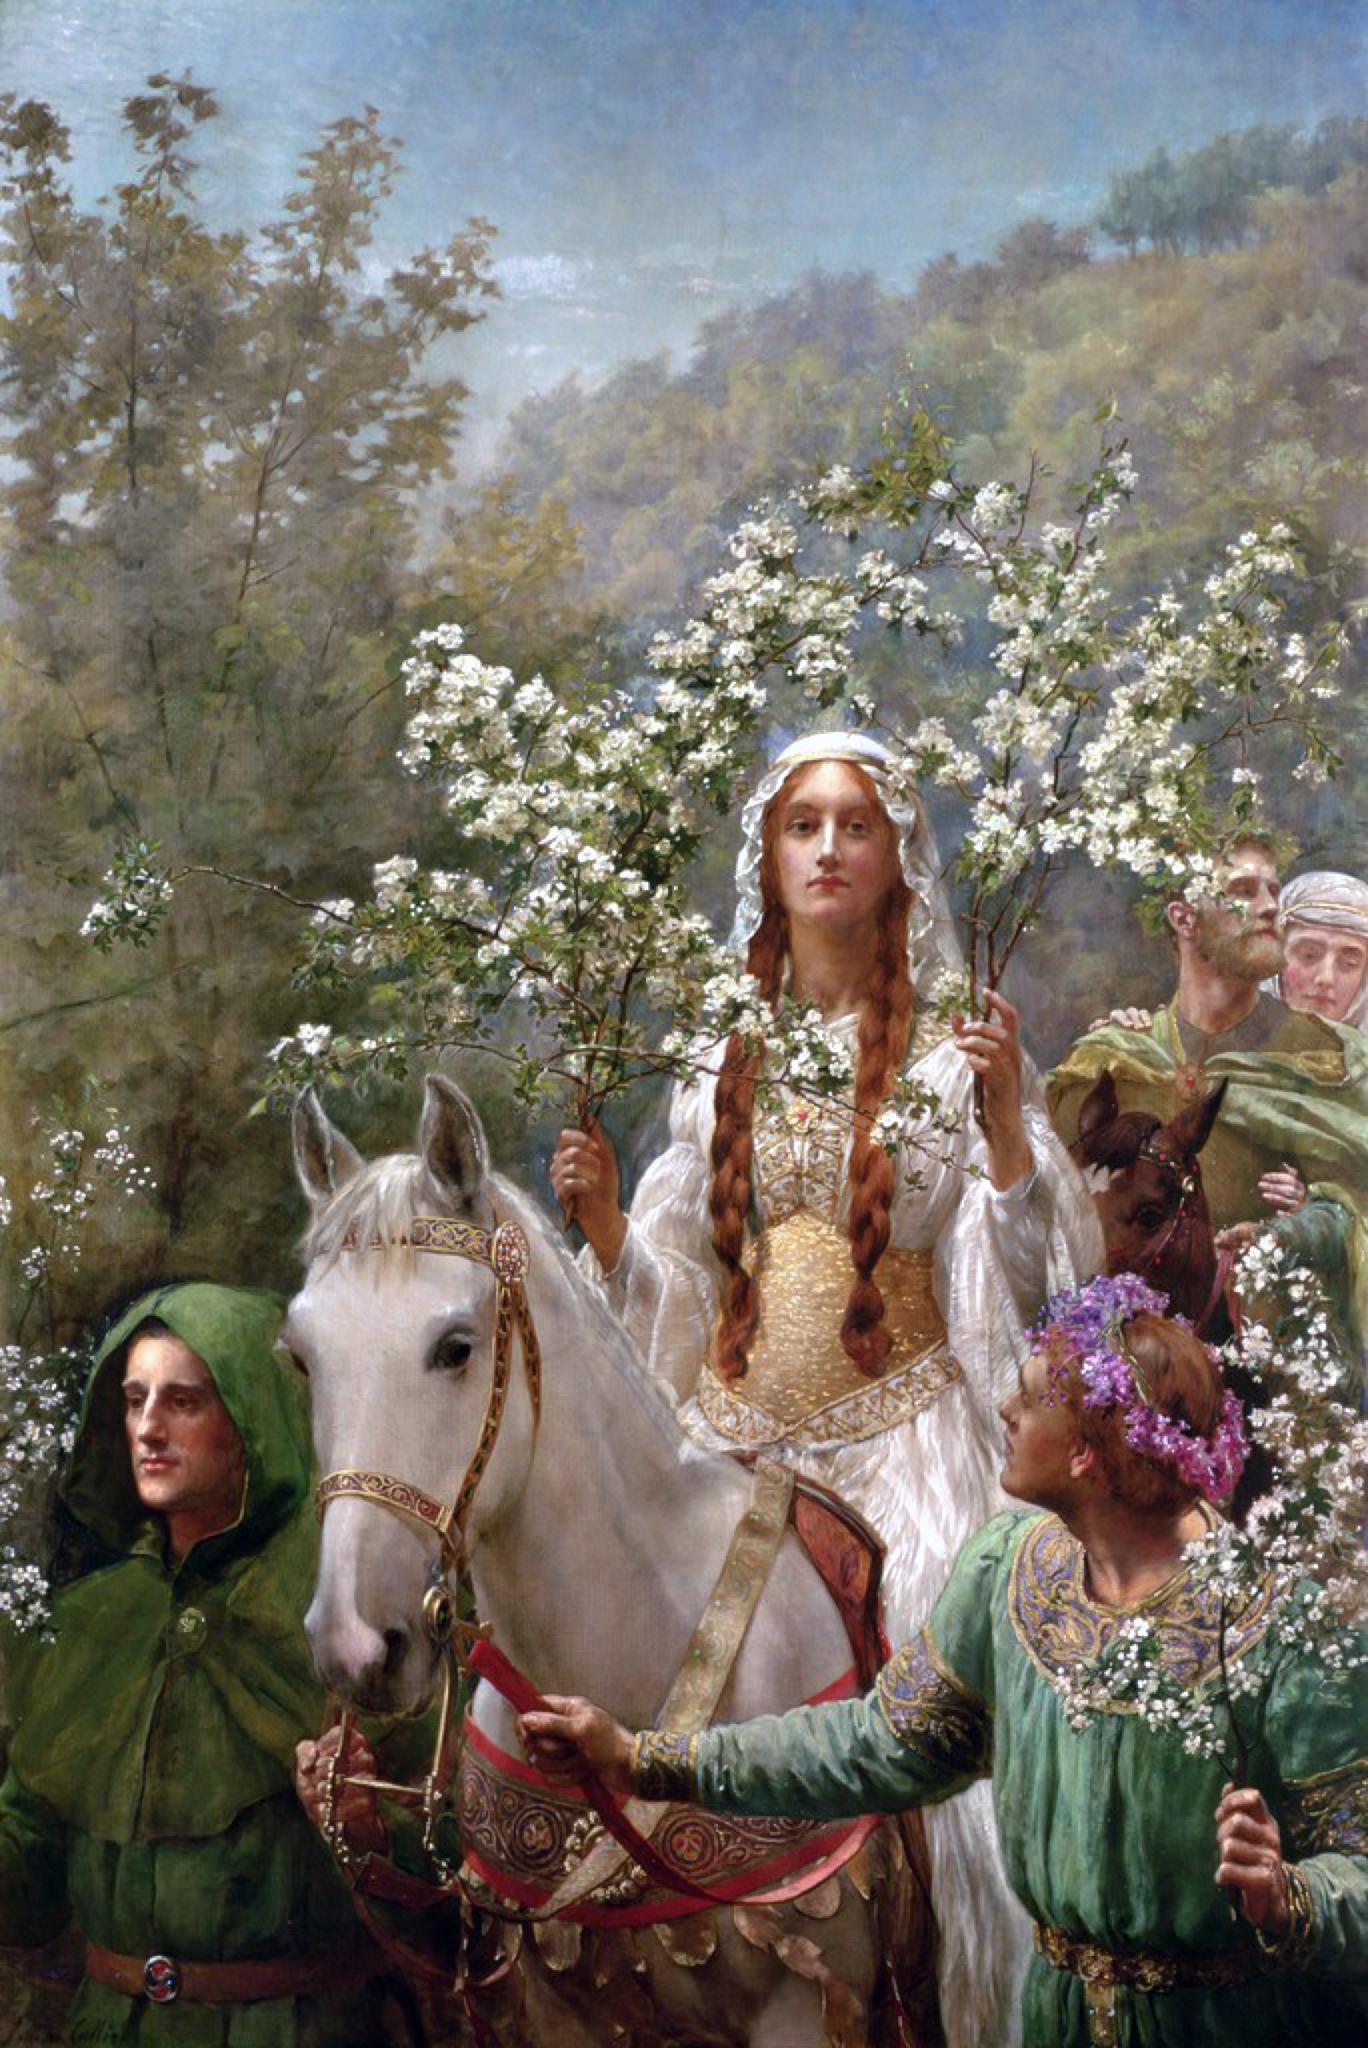 https://i0.wp.com/upload.wikimedia.org/wikipedia/commons/6/6f/John_Collier_Queen_Guinevre%27s_Maying.jpg